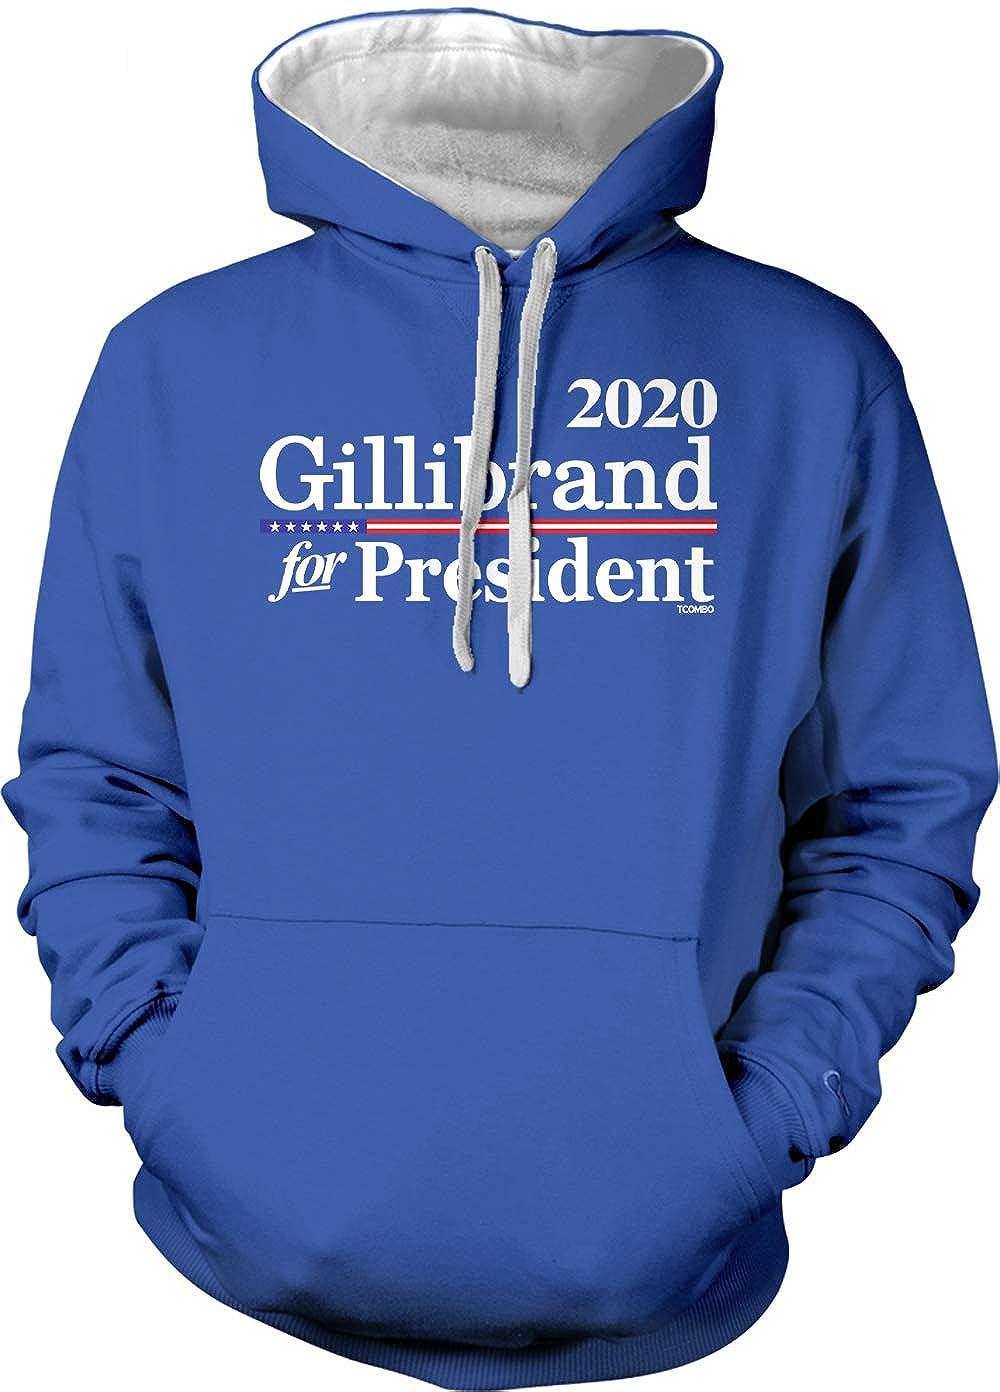 Tcombo Kirsten Gillibrand for President 2020 Unisex Hoodie Sweatshirt